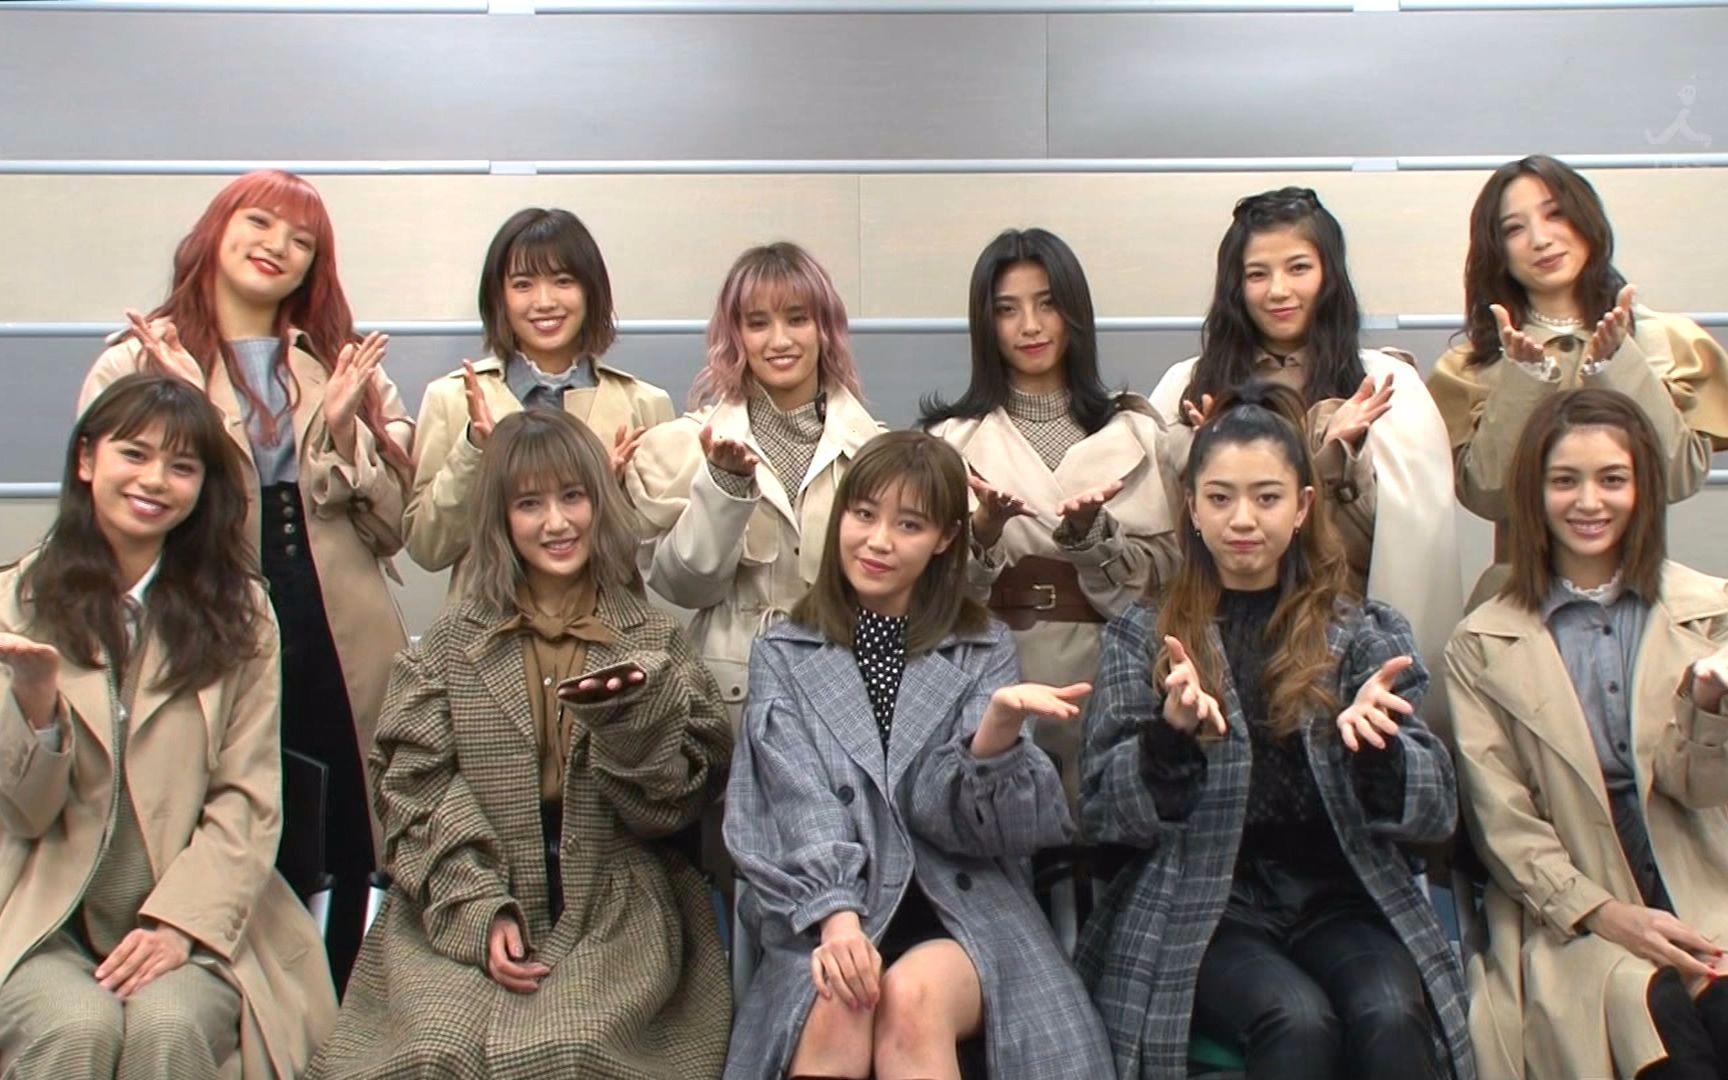 E-girls - 北風と太陽 (17.12.10.CDTV)_嗶哩嗶哩 (゜-゜)つロ 干杯~-bilibili